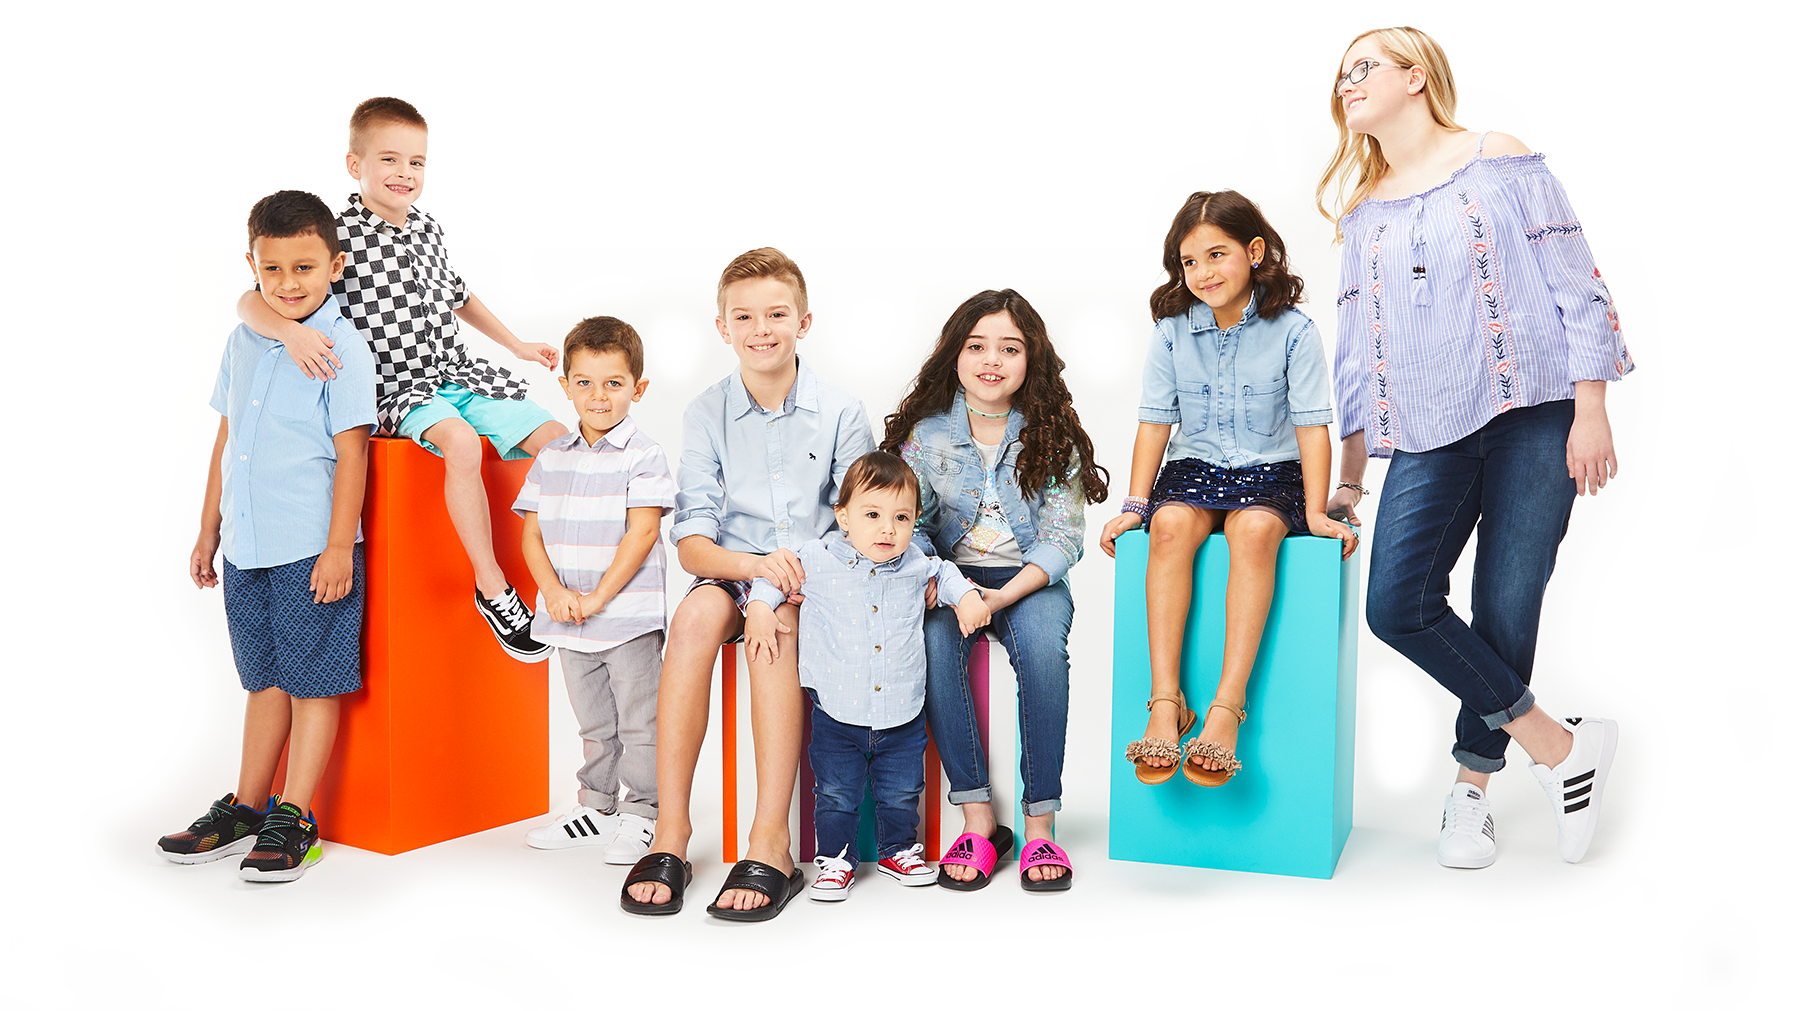 kids club with Justin, Allen, Harrison, Tyler, Javi, Rachel Anne, Camdyn, and Evelyn